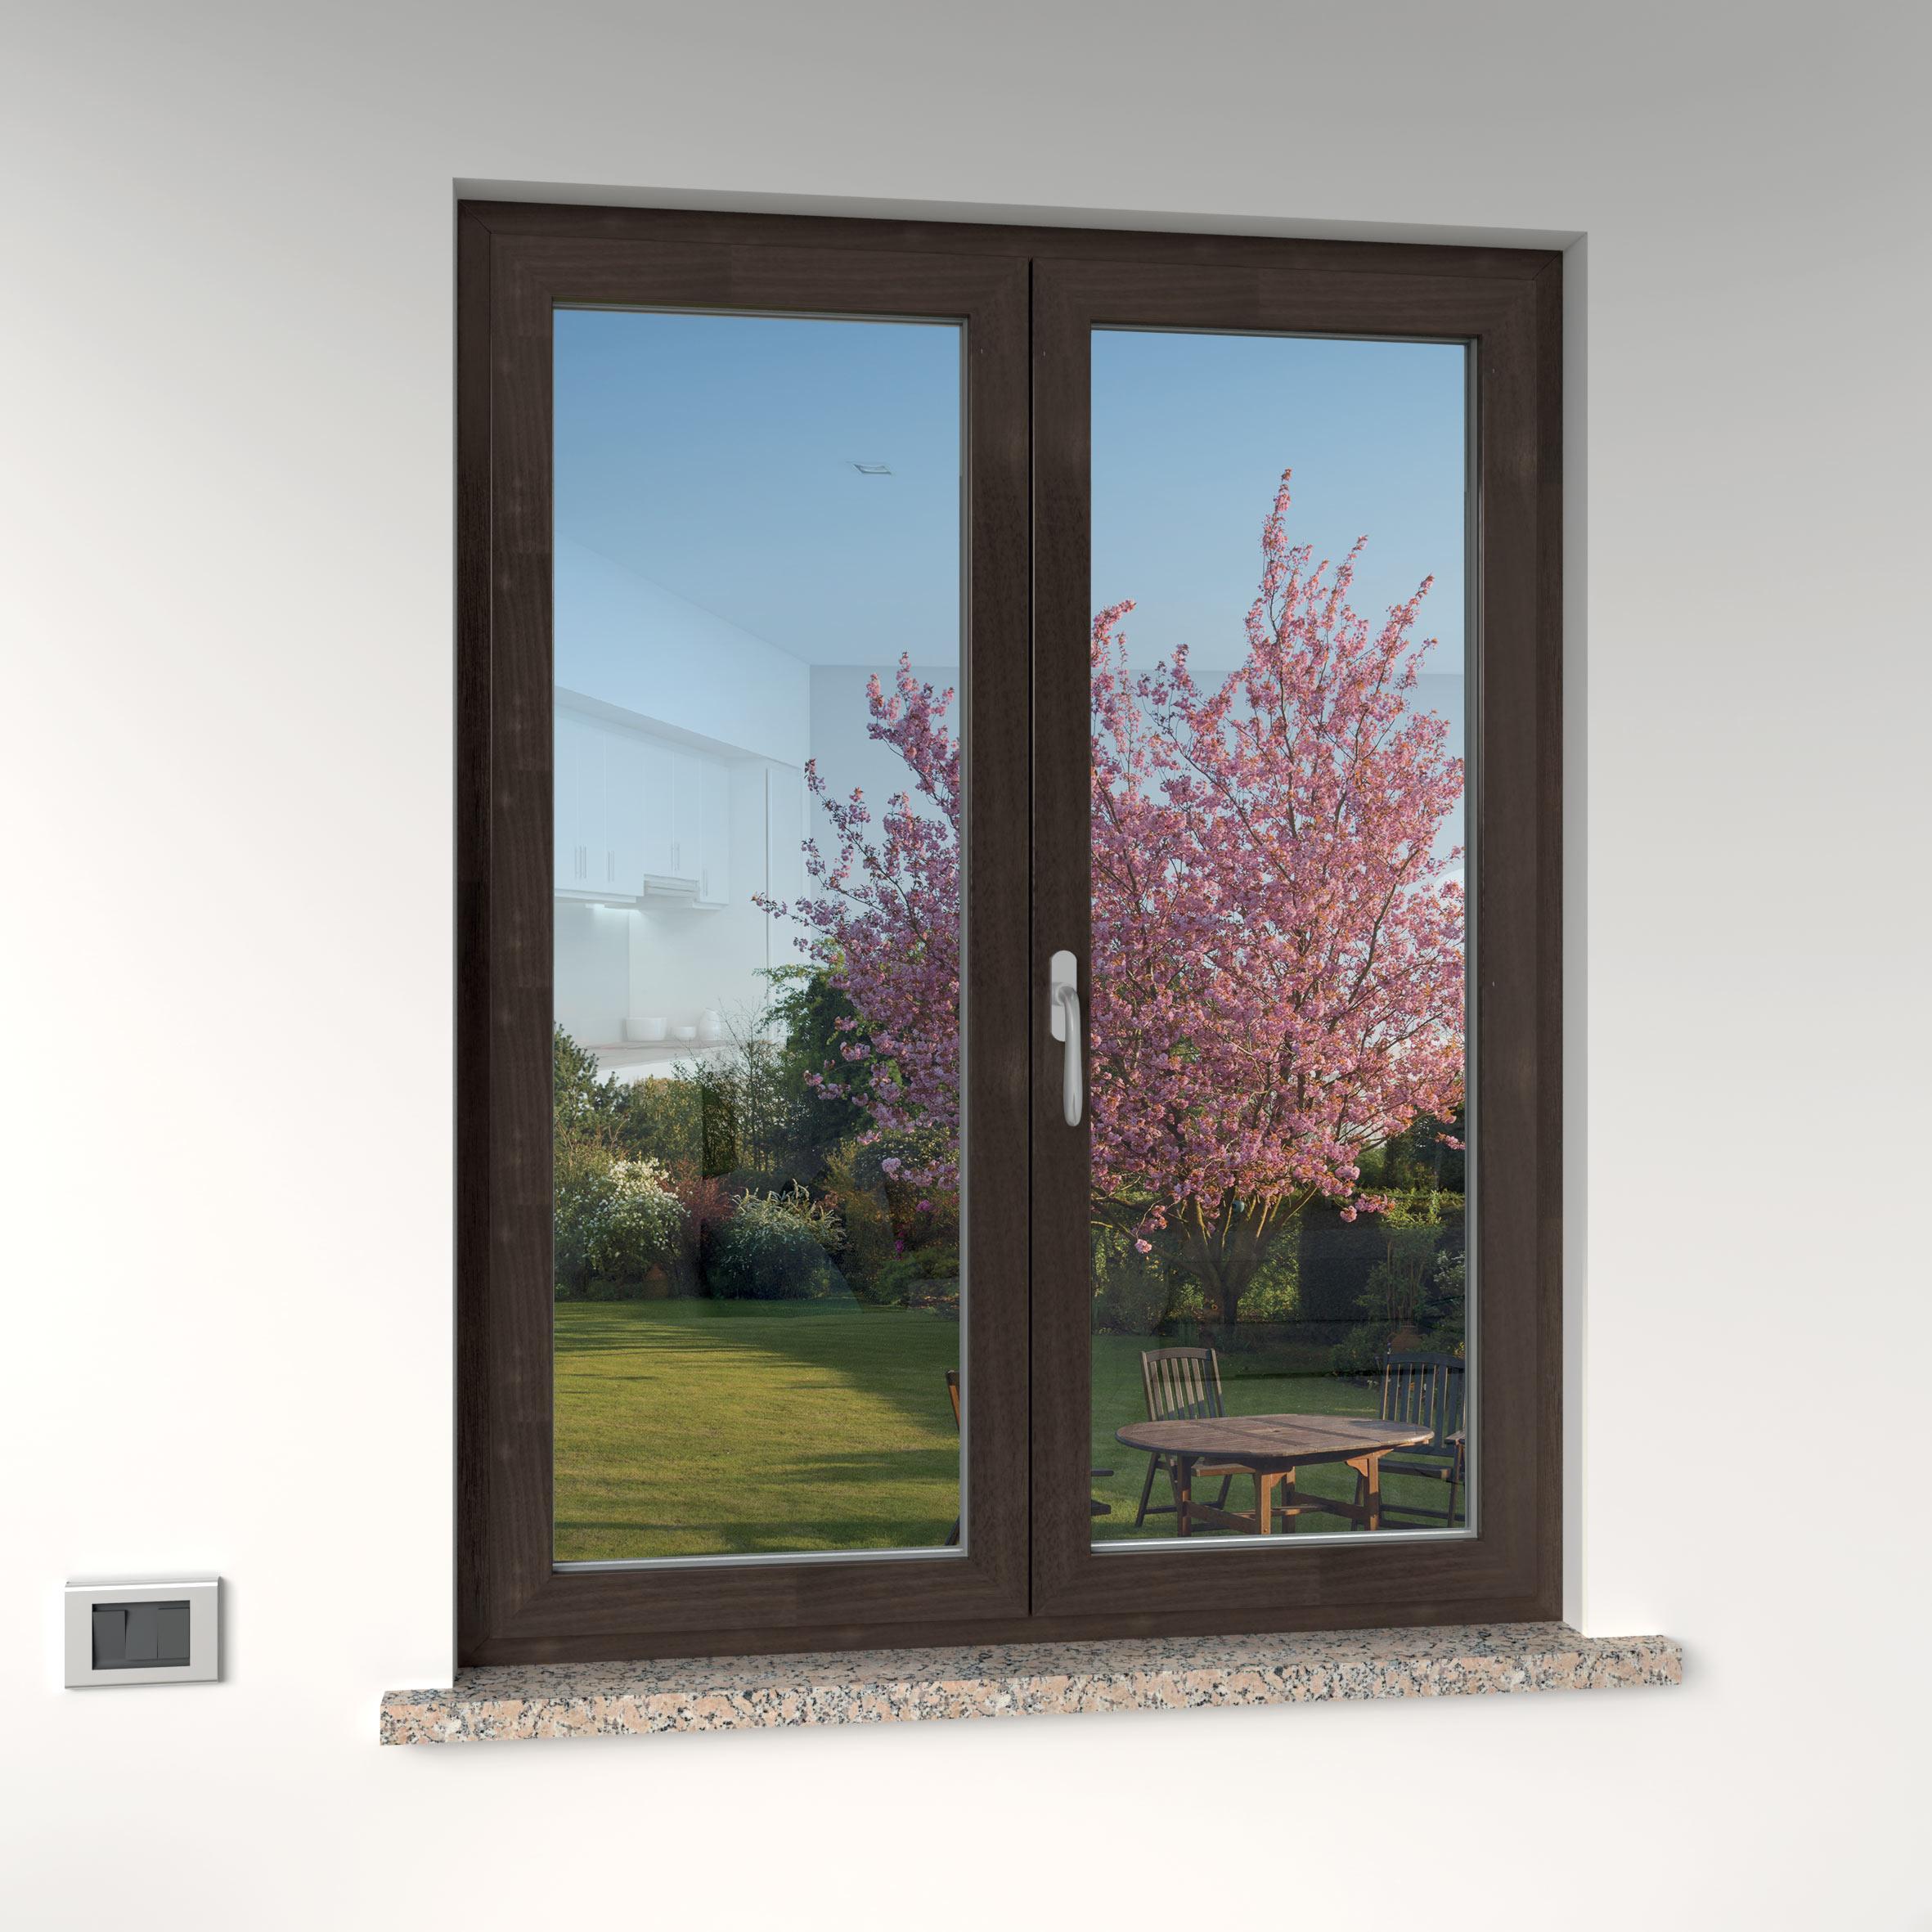 https://www.allpaint.it/wp-content/uploads/2021/09/finestre-woodlineTT-legno-allpaint.jpg